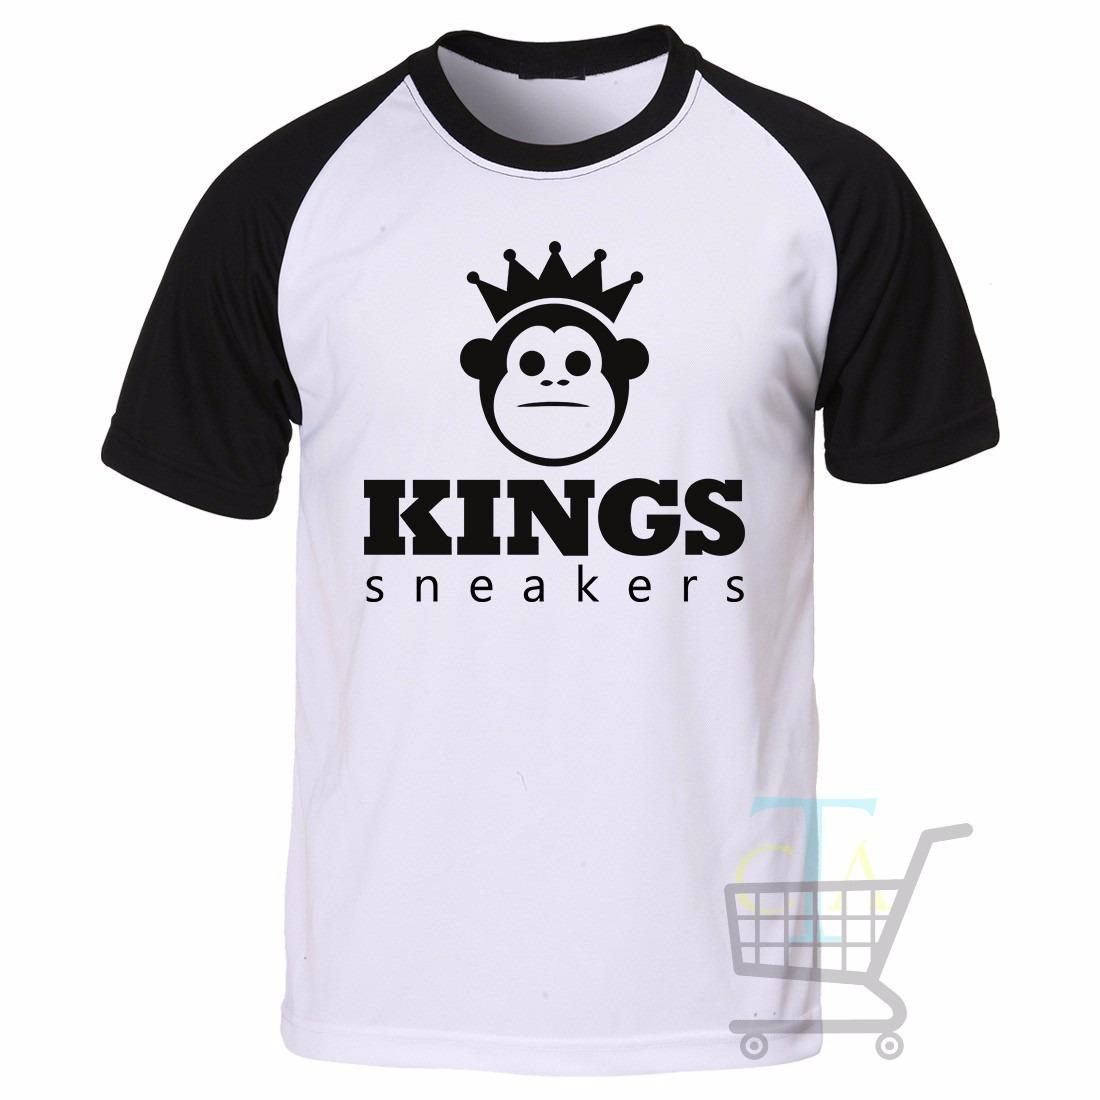 Camiseta Kings Sneakers Raglan Manga Curta - Promoção - R  39 4751c5bae82